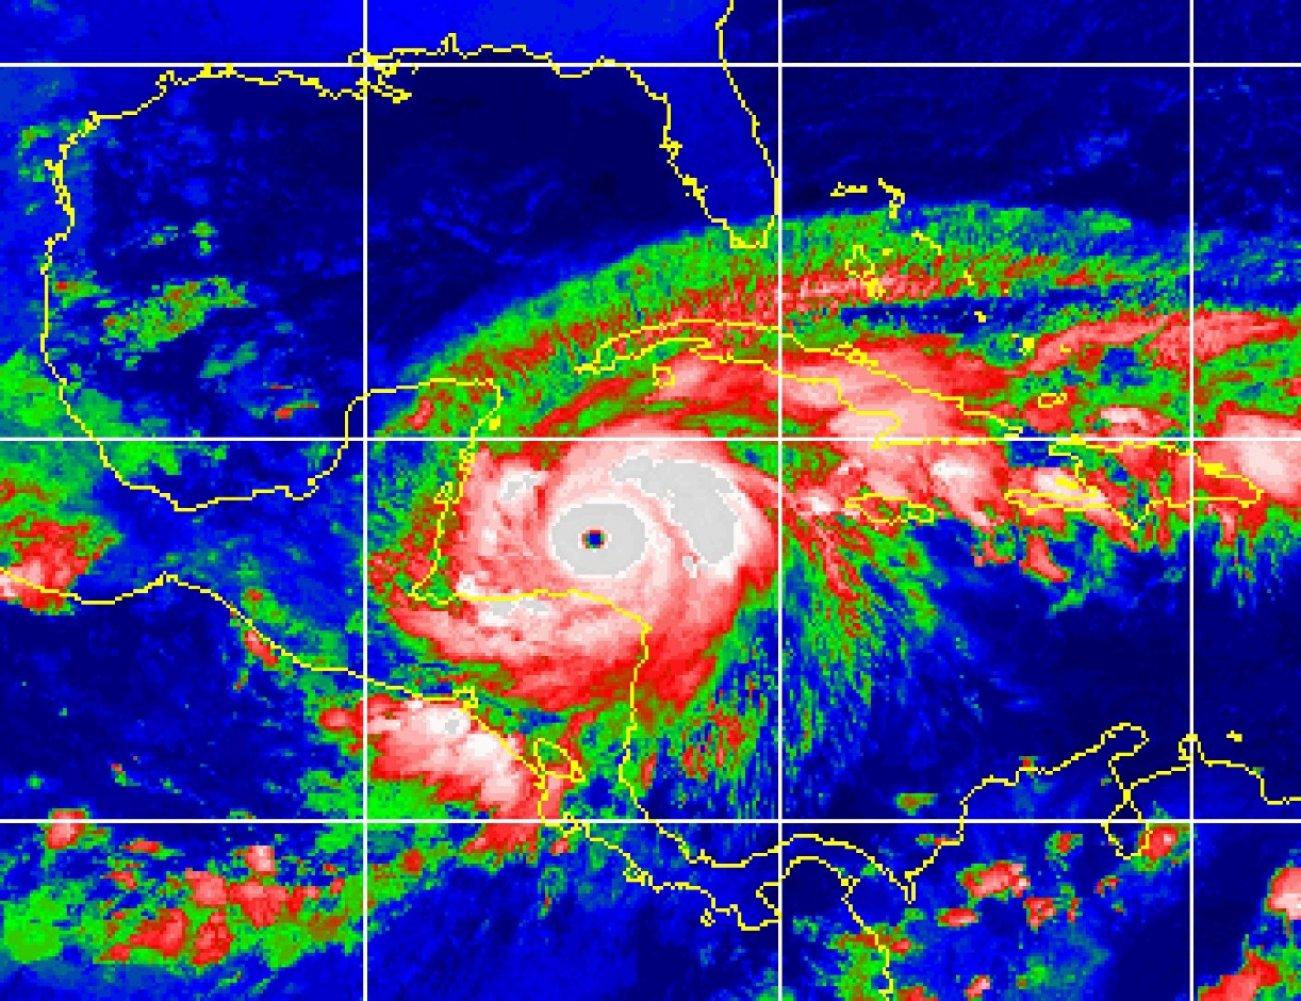 Craziest Idea Ever: Drop a Nuclear Bomb on a Hurricane